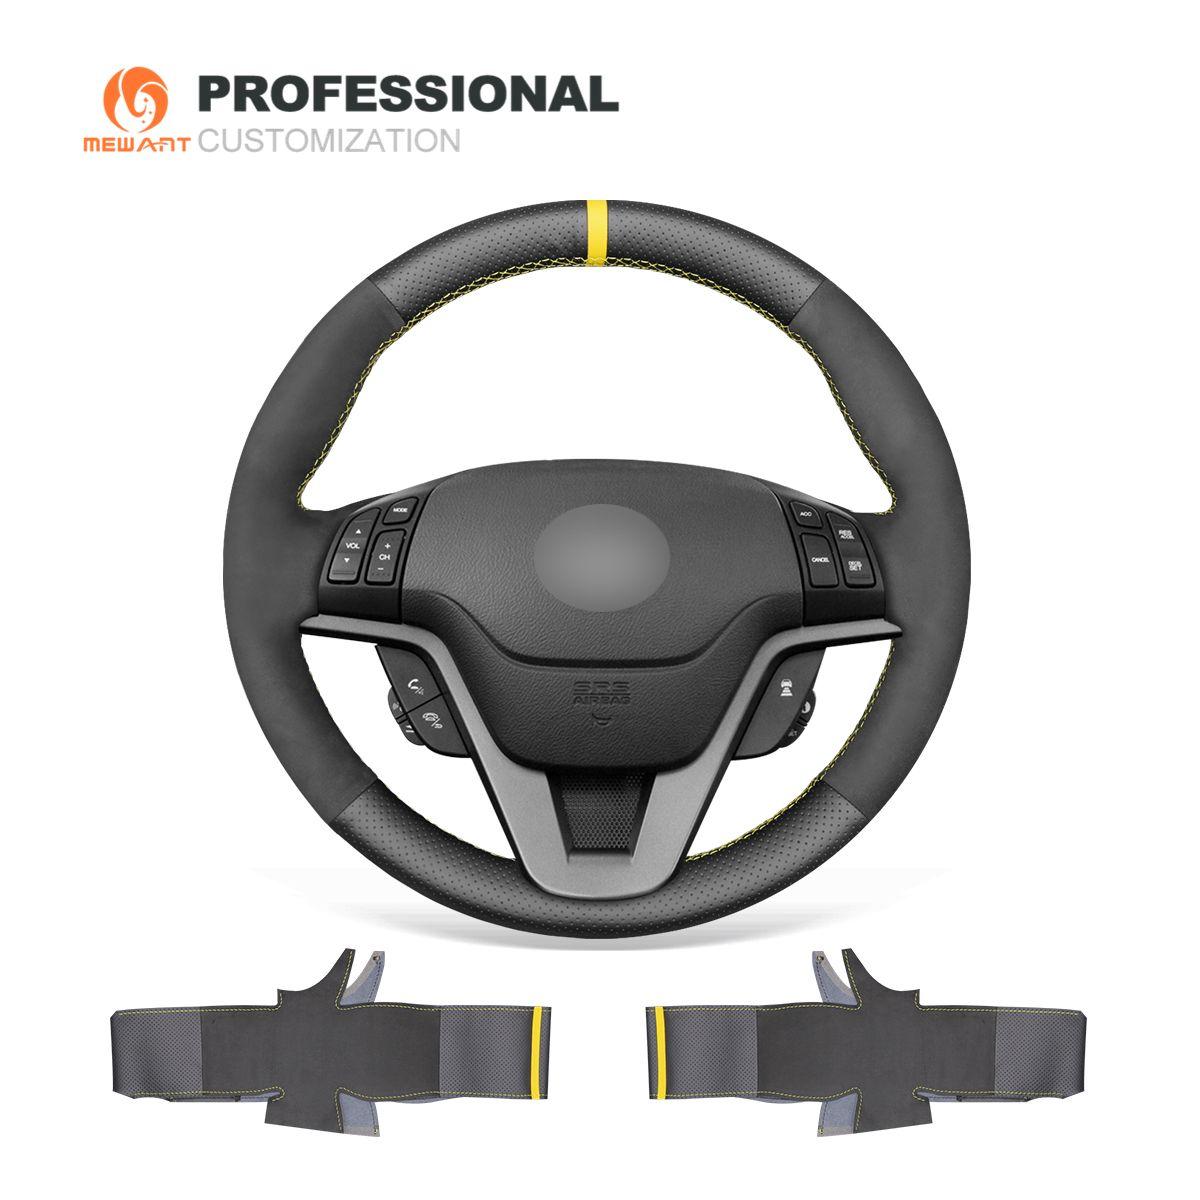 MEWANT Black Genuine Leather Black Suede Hand Sew Car Steering Wheel Cover for Honda CR-V CRV 2007 2008 2009 2010 2011